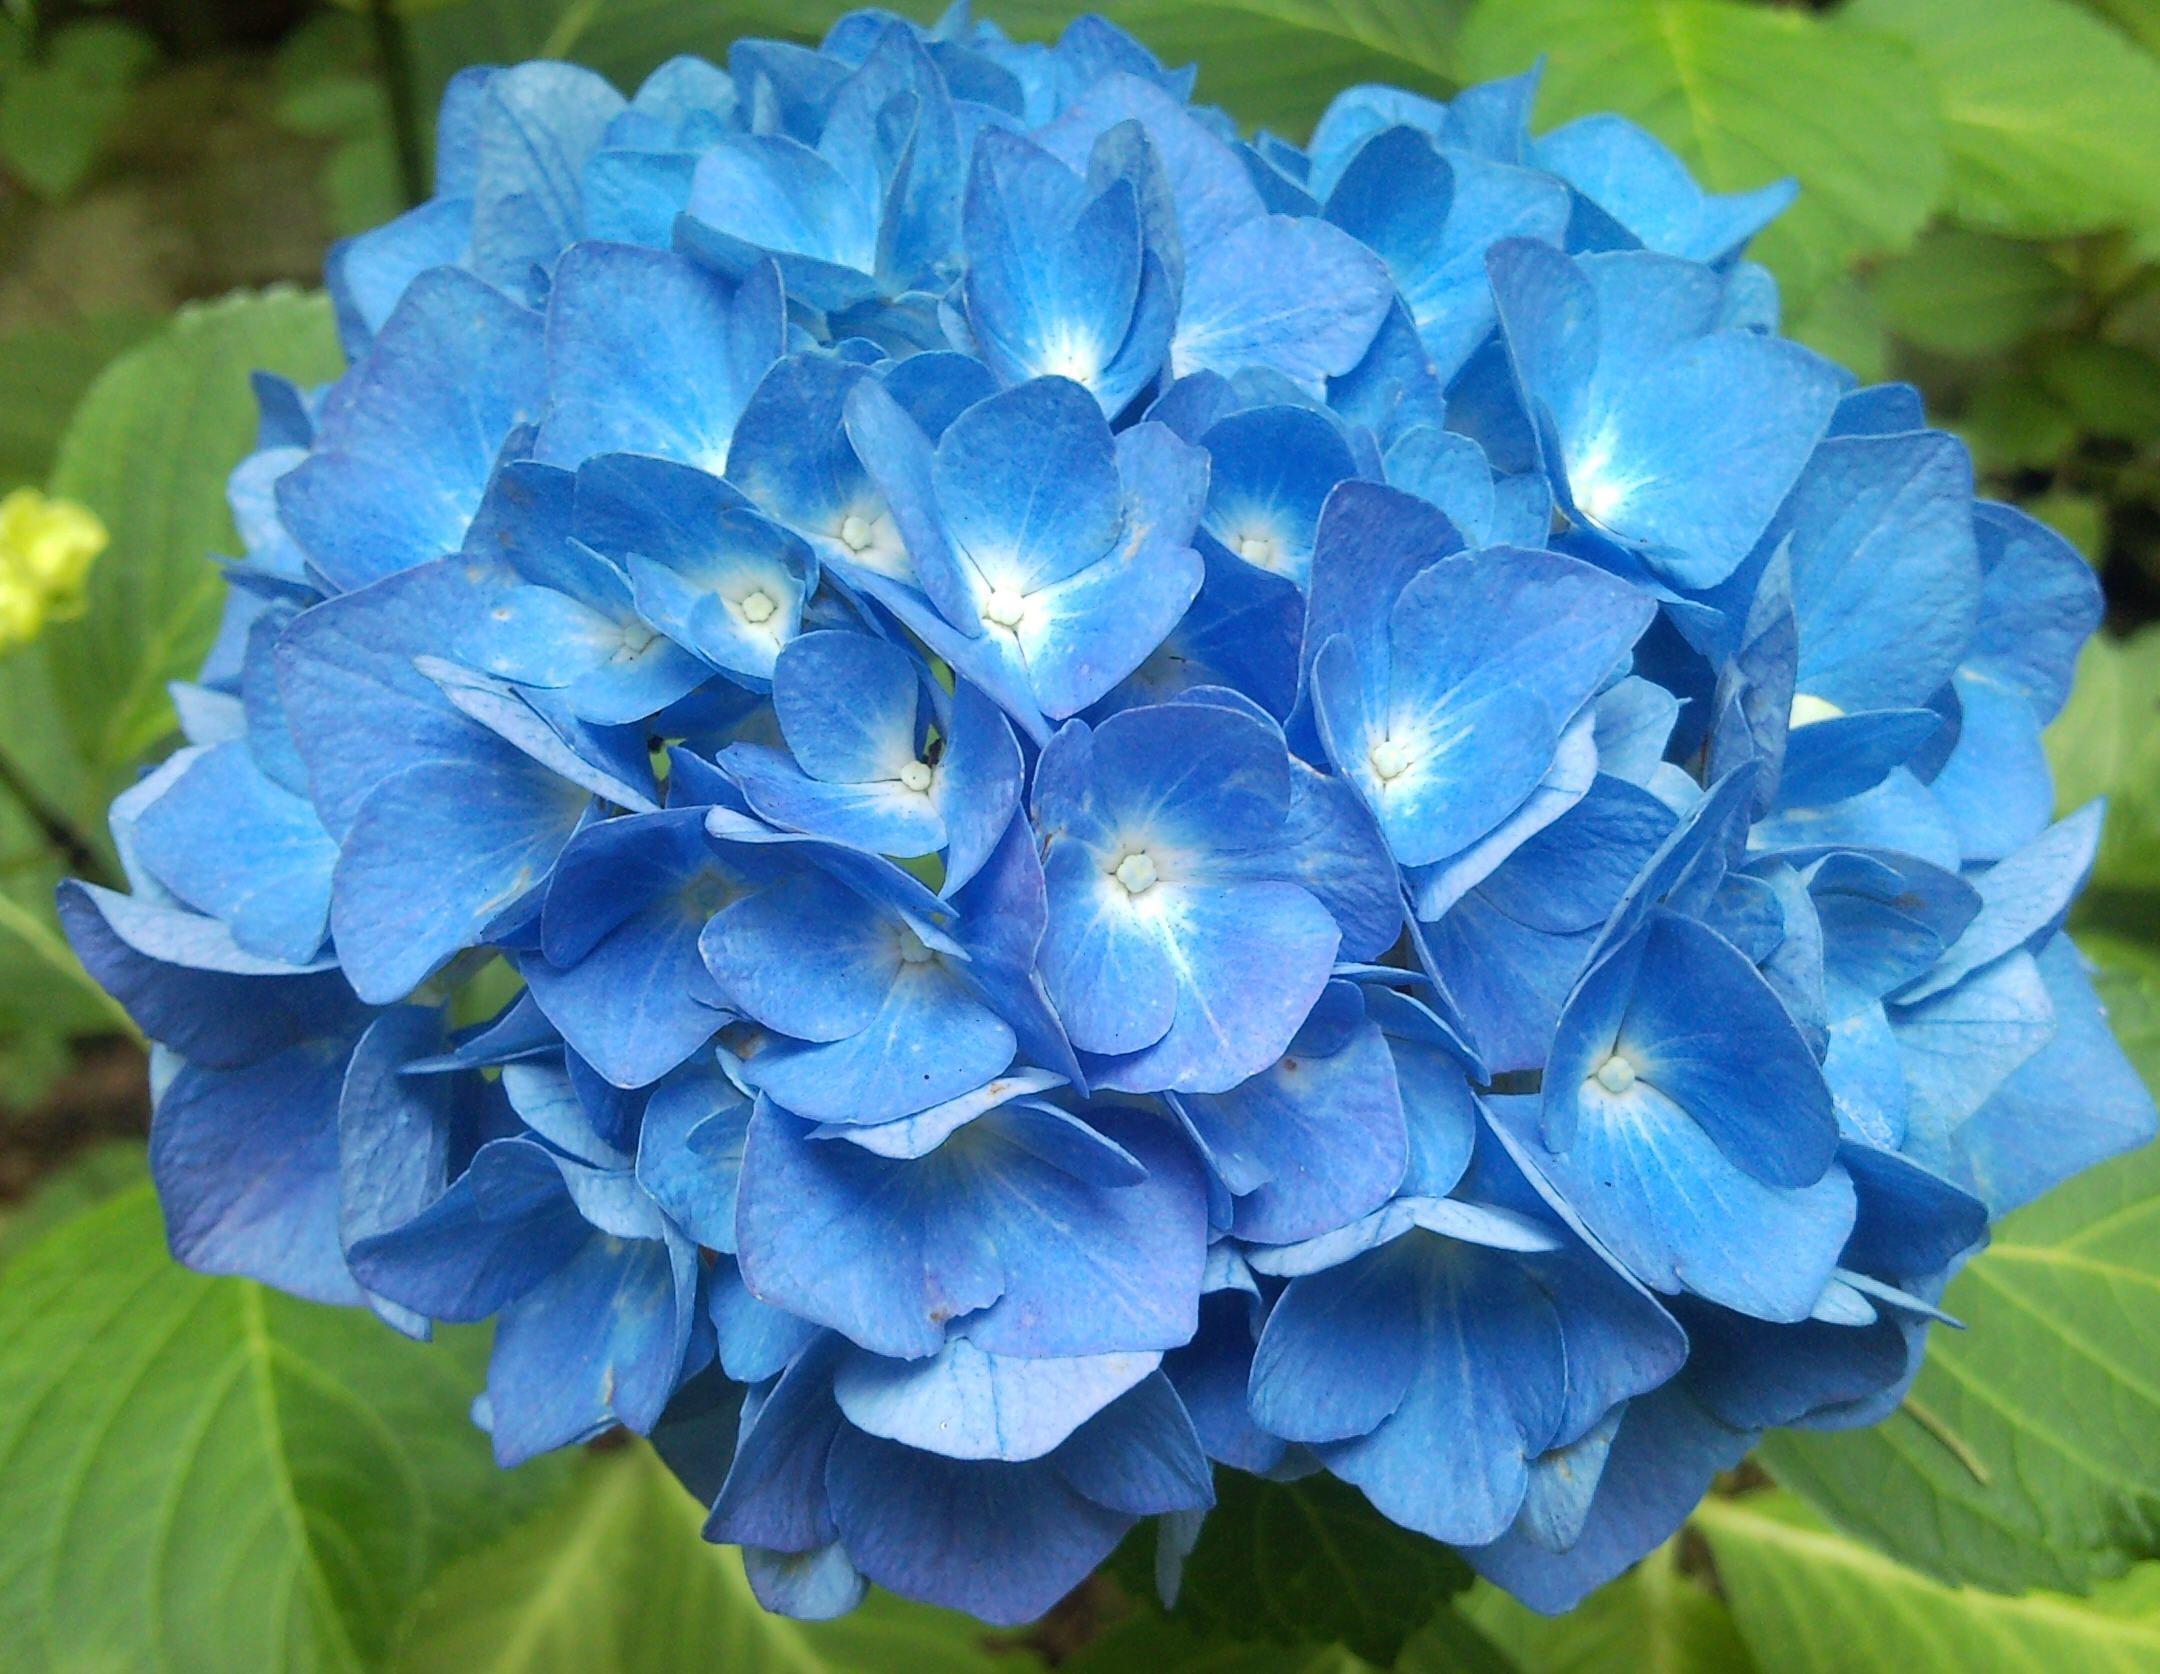 Blaue Hortensie Blumen Im Oktober Varios Pinterest Flowers